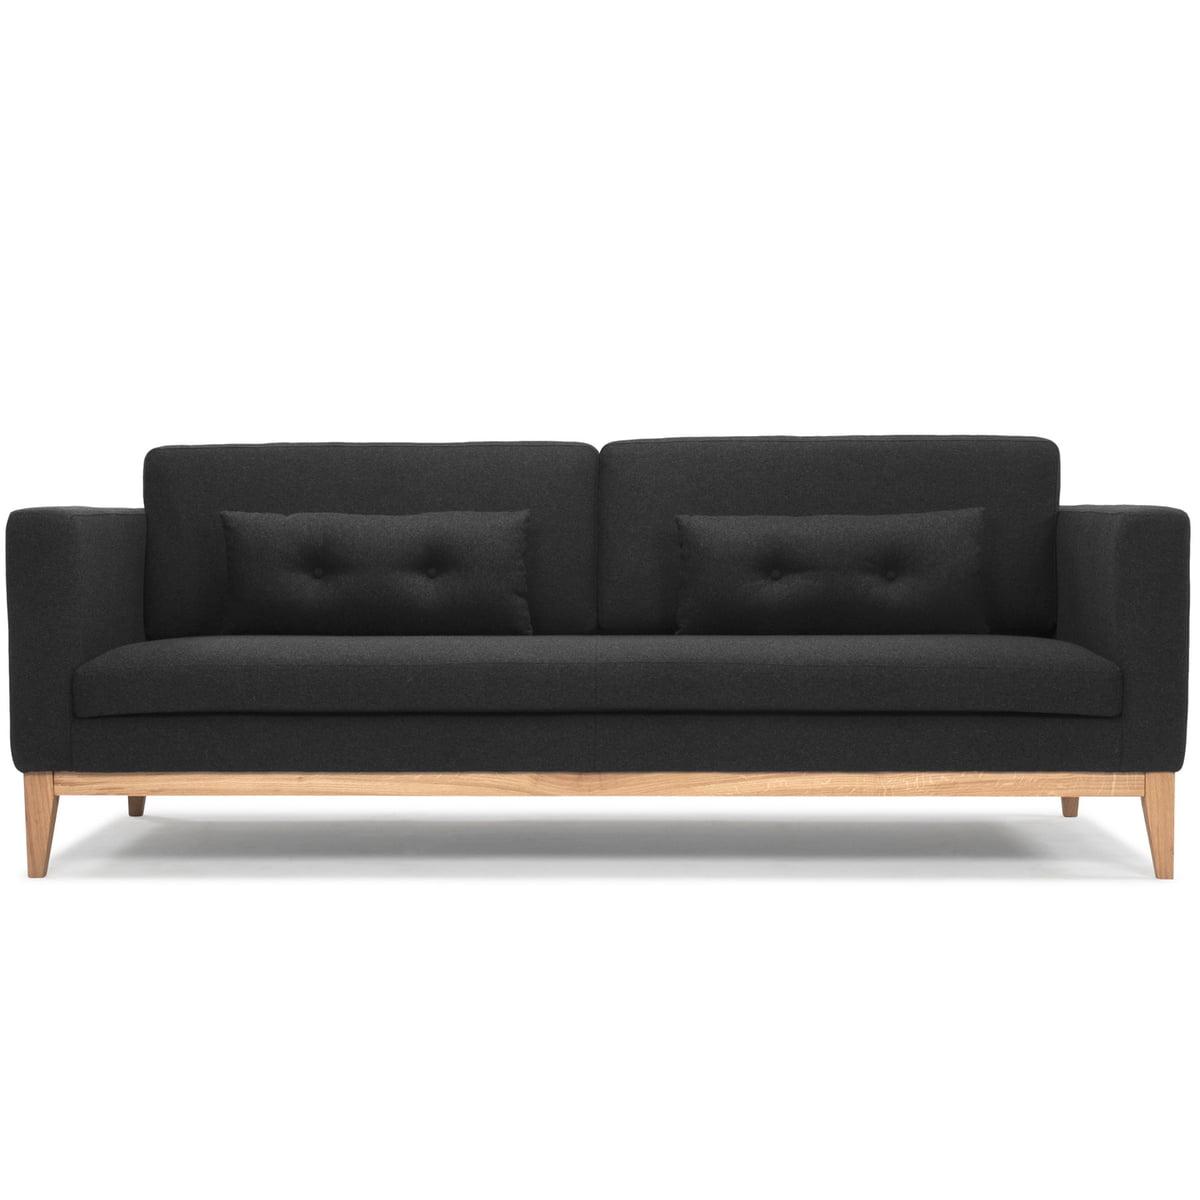 Designe house stockholm day sofa darkgrey front freisteller